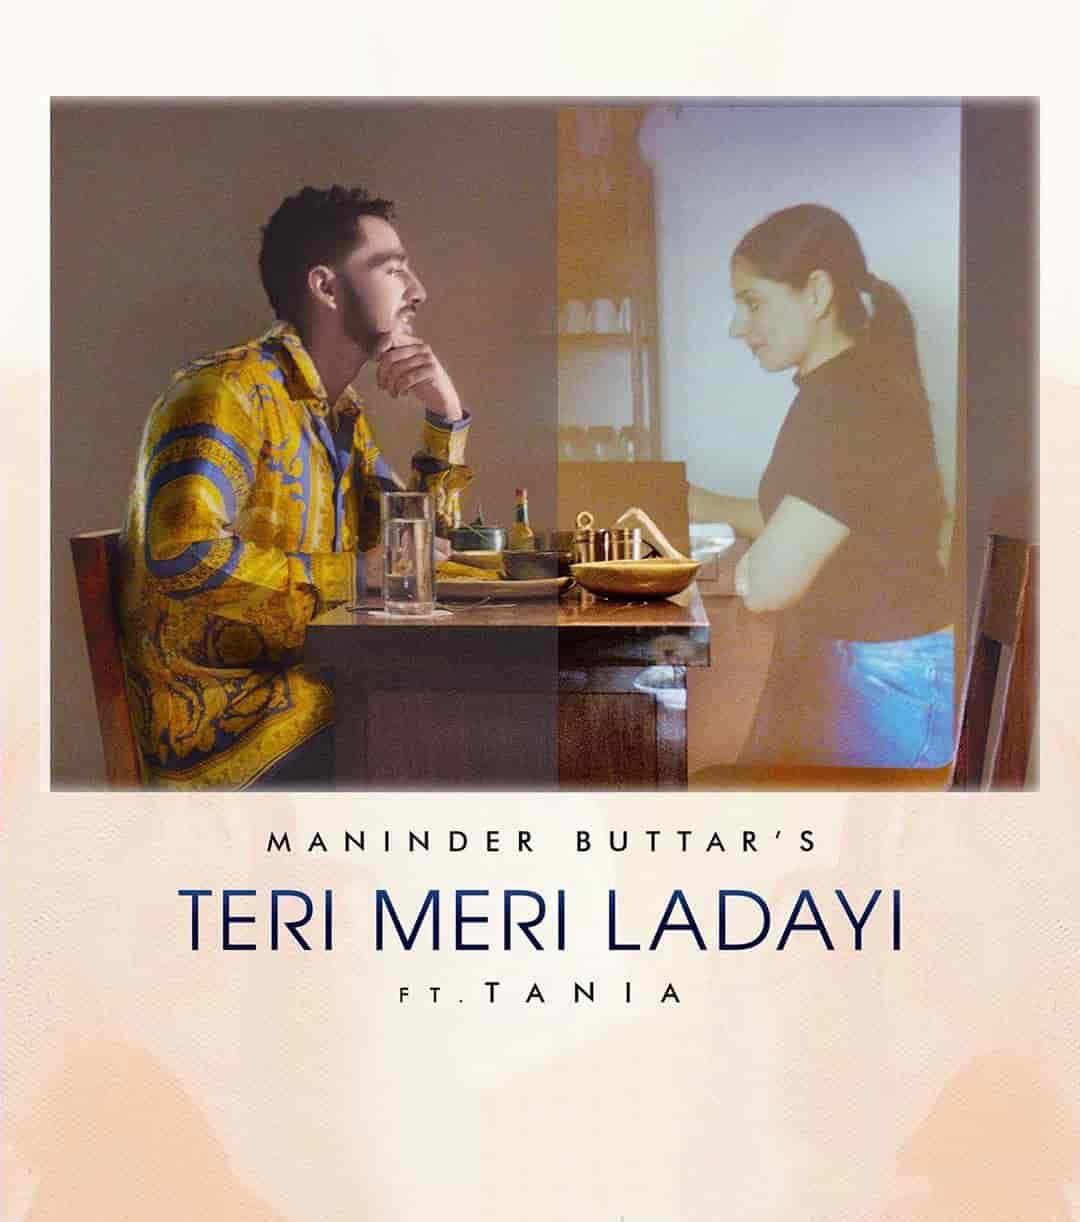 Teri Meri Ladayi Punjabi Song Image By Maninder Buttar from album Jugni